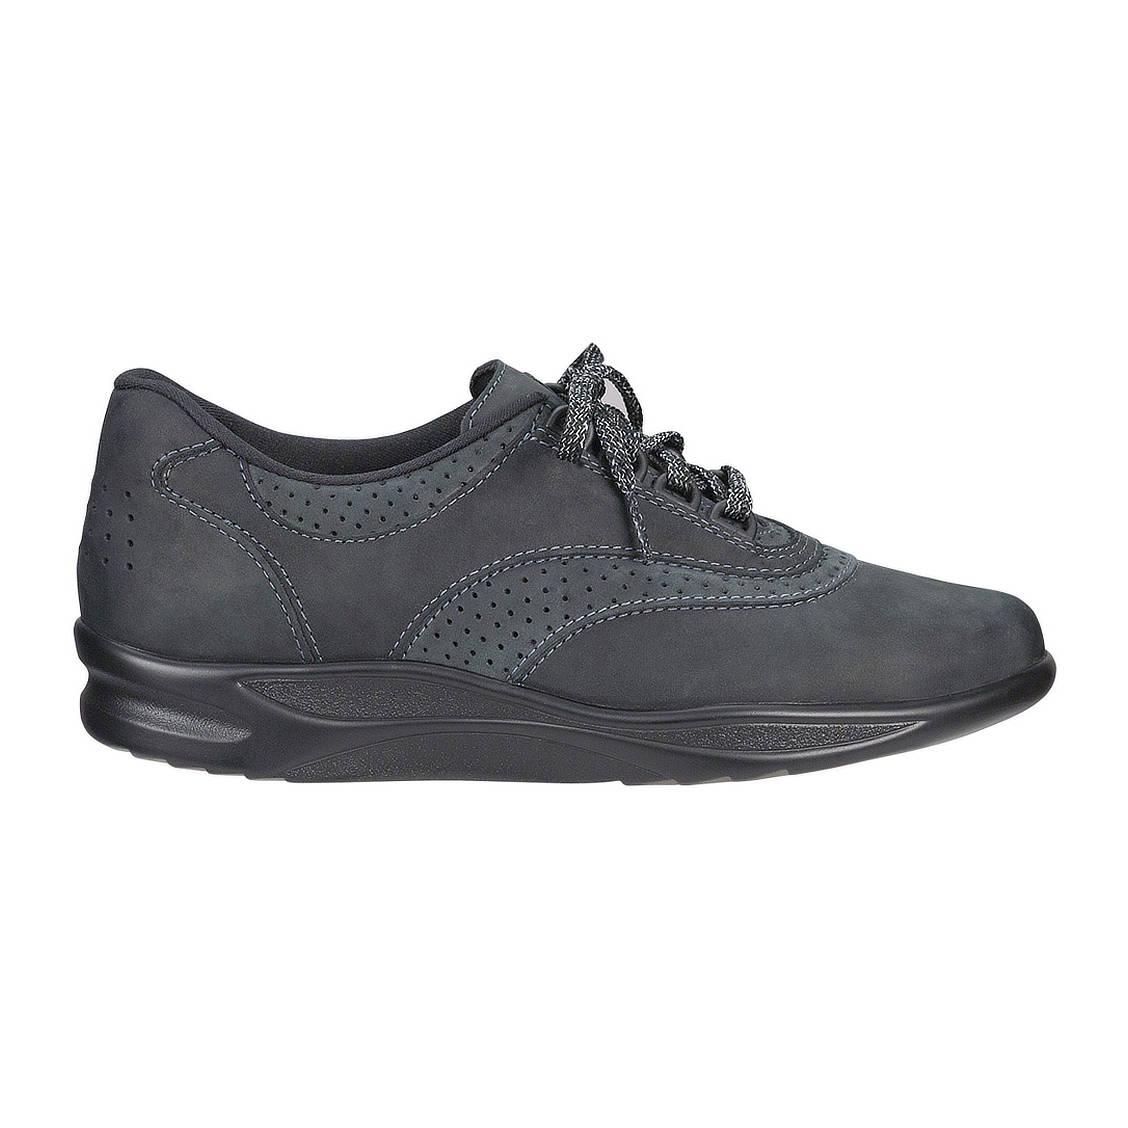 sas-womens-walk-easy-nero-charcoal-nubuck-2380-237-3